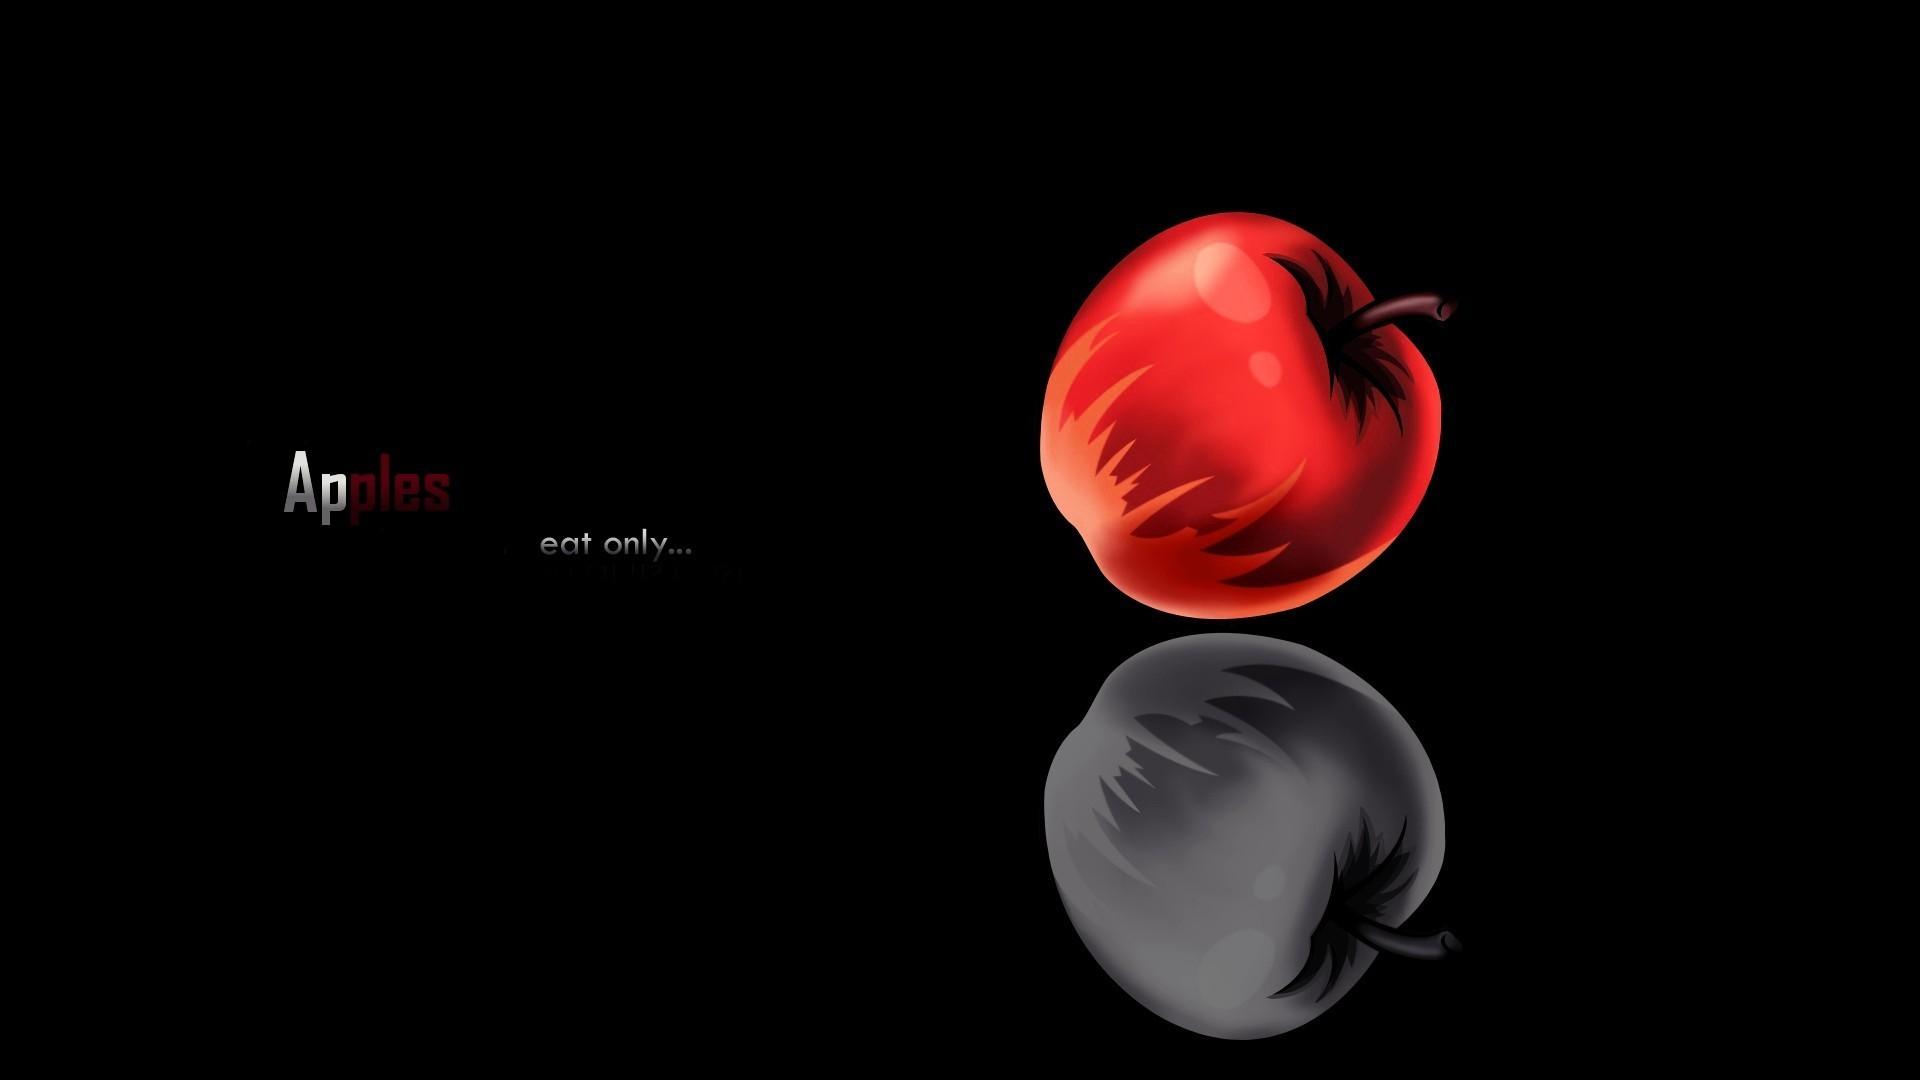 Res: 1920x1080, Death note minimalistic apples wallpaper